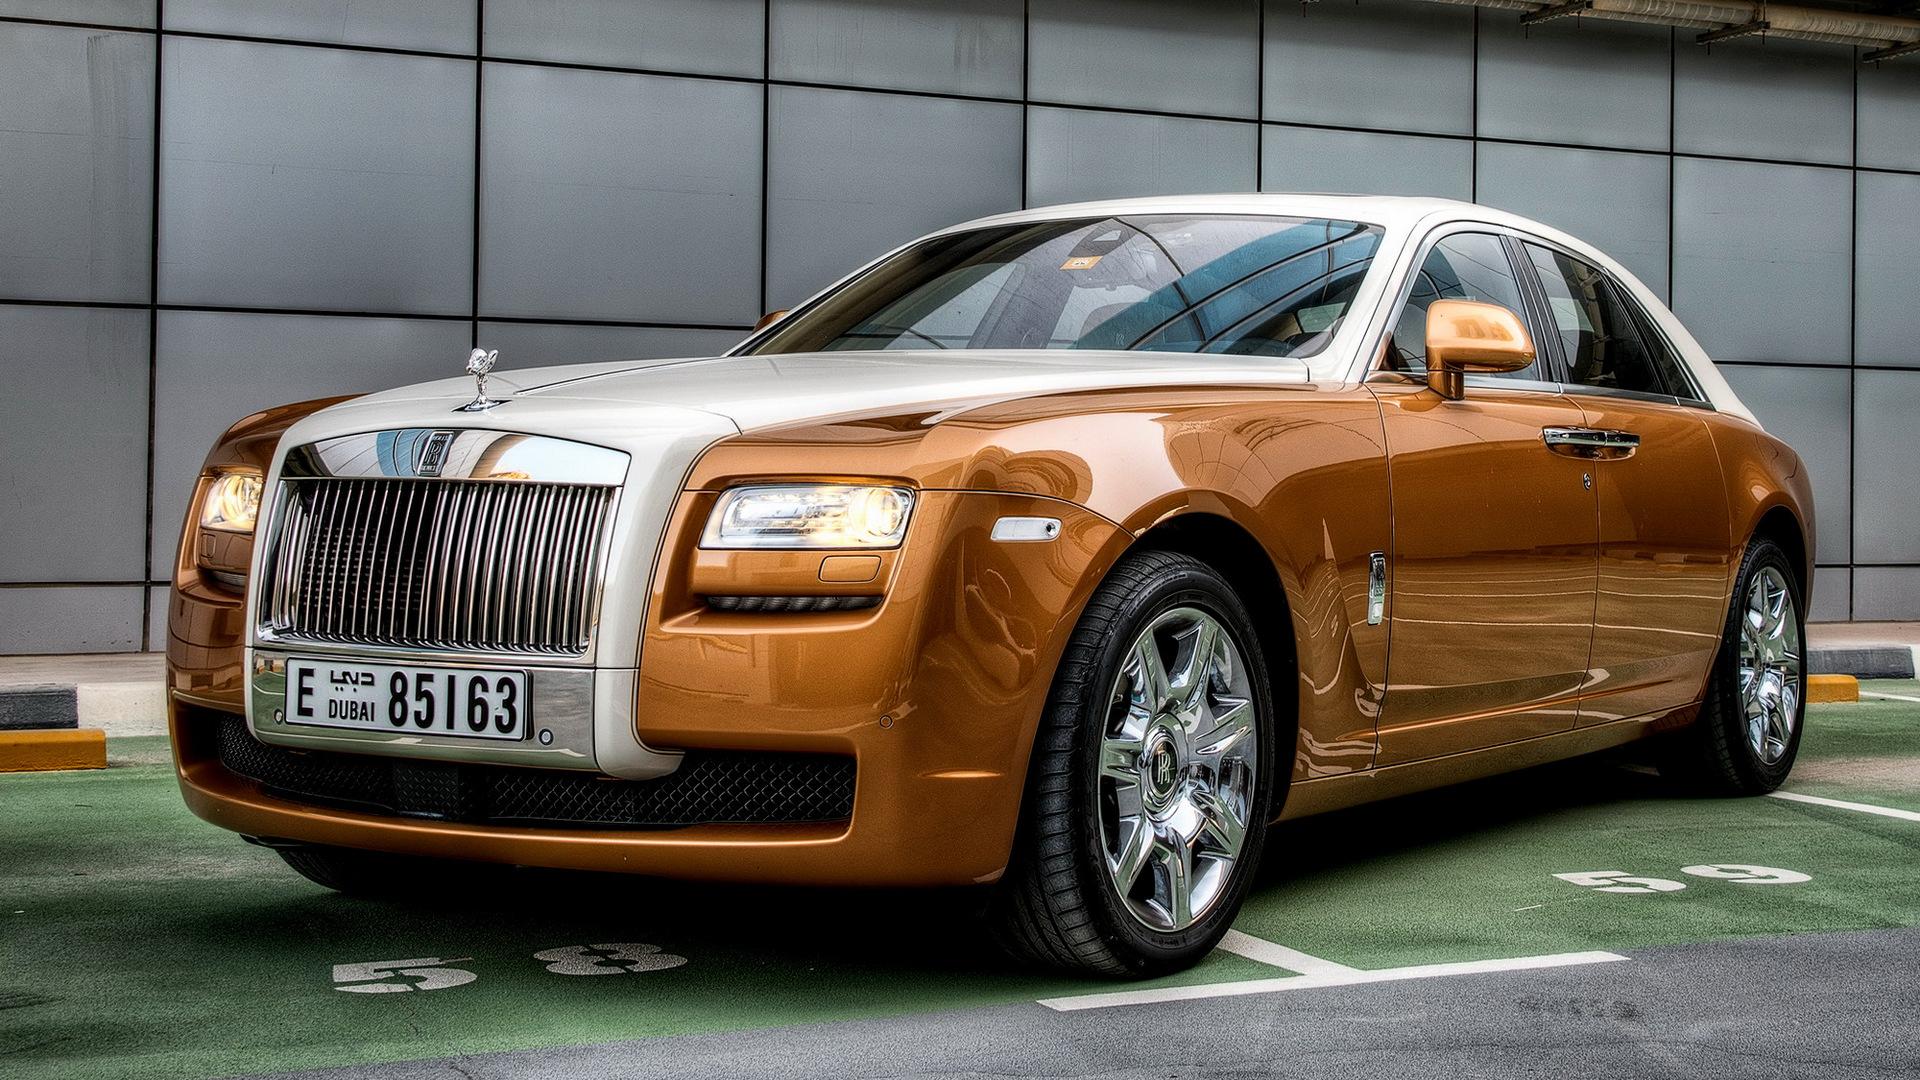 2009 Rolls-Royce Ghost HD Wallpaper   Background Image ...